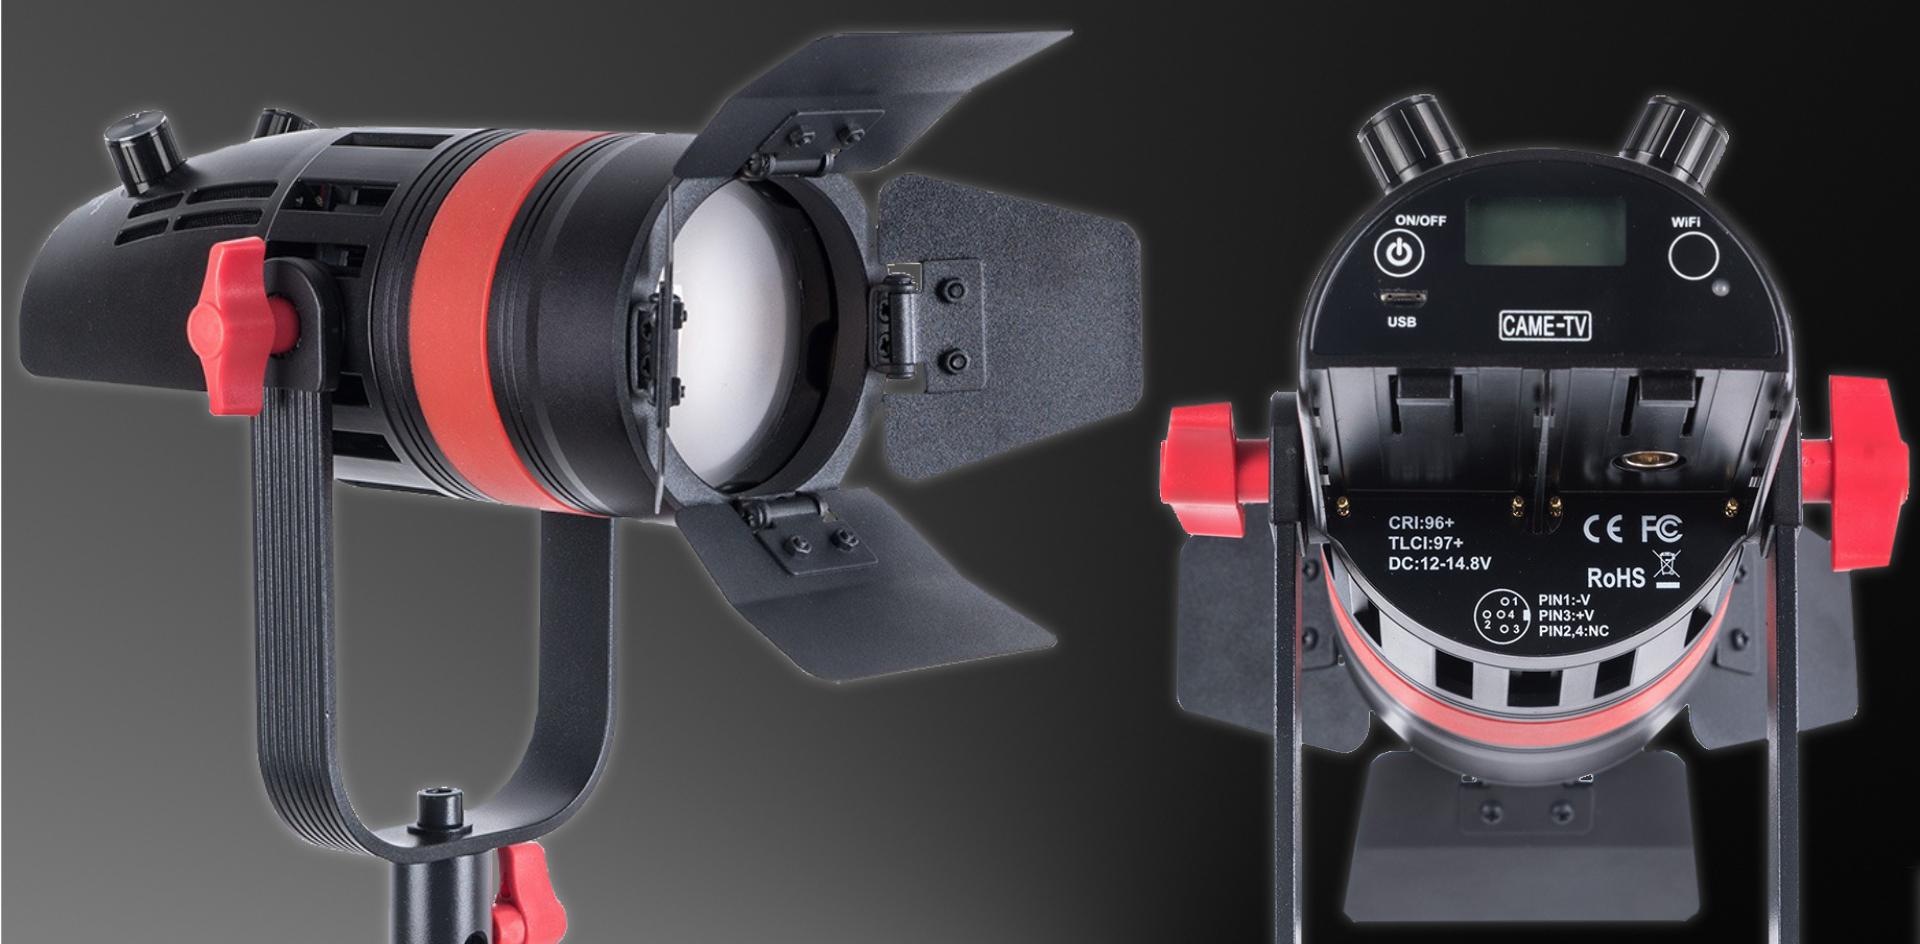 CAME-TVがBoltzen Q-55SバイカラーフレネルLEDライトを発表